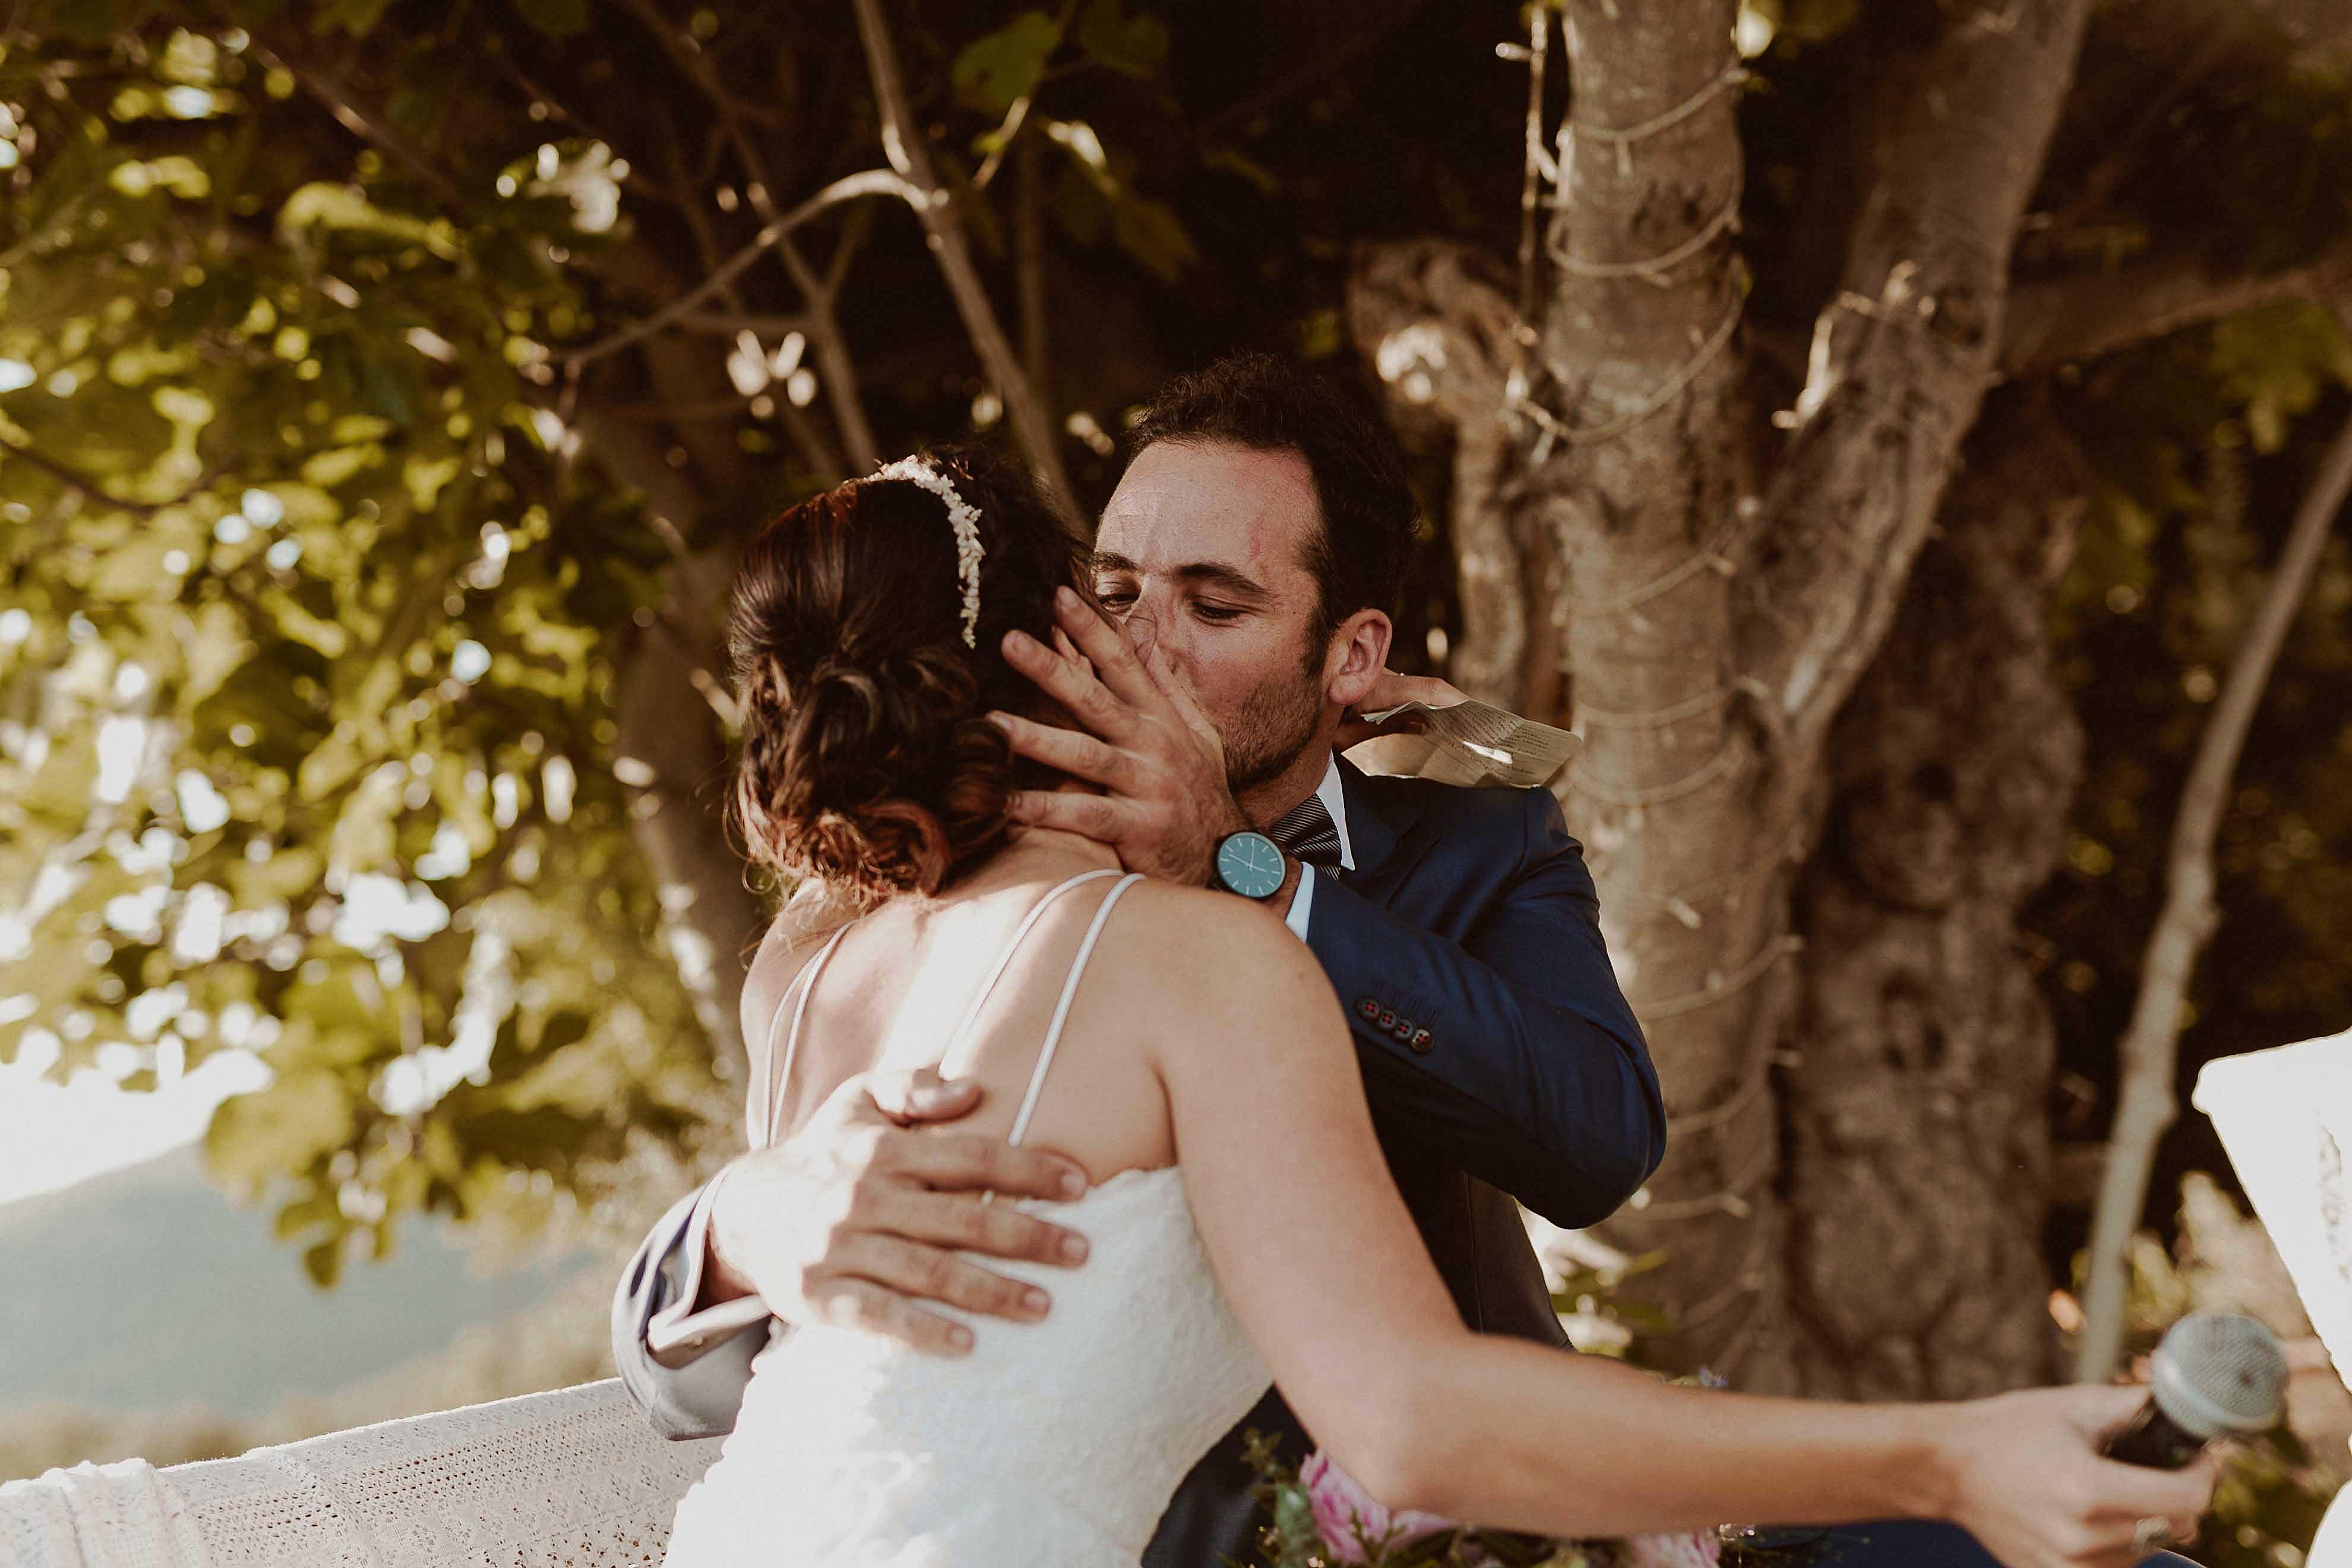 Boda rústica en la montaña. fotgrafo de bodas barcelona_059